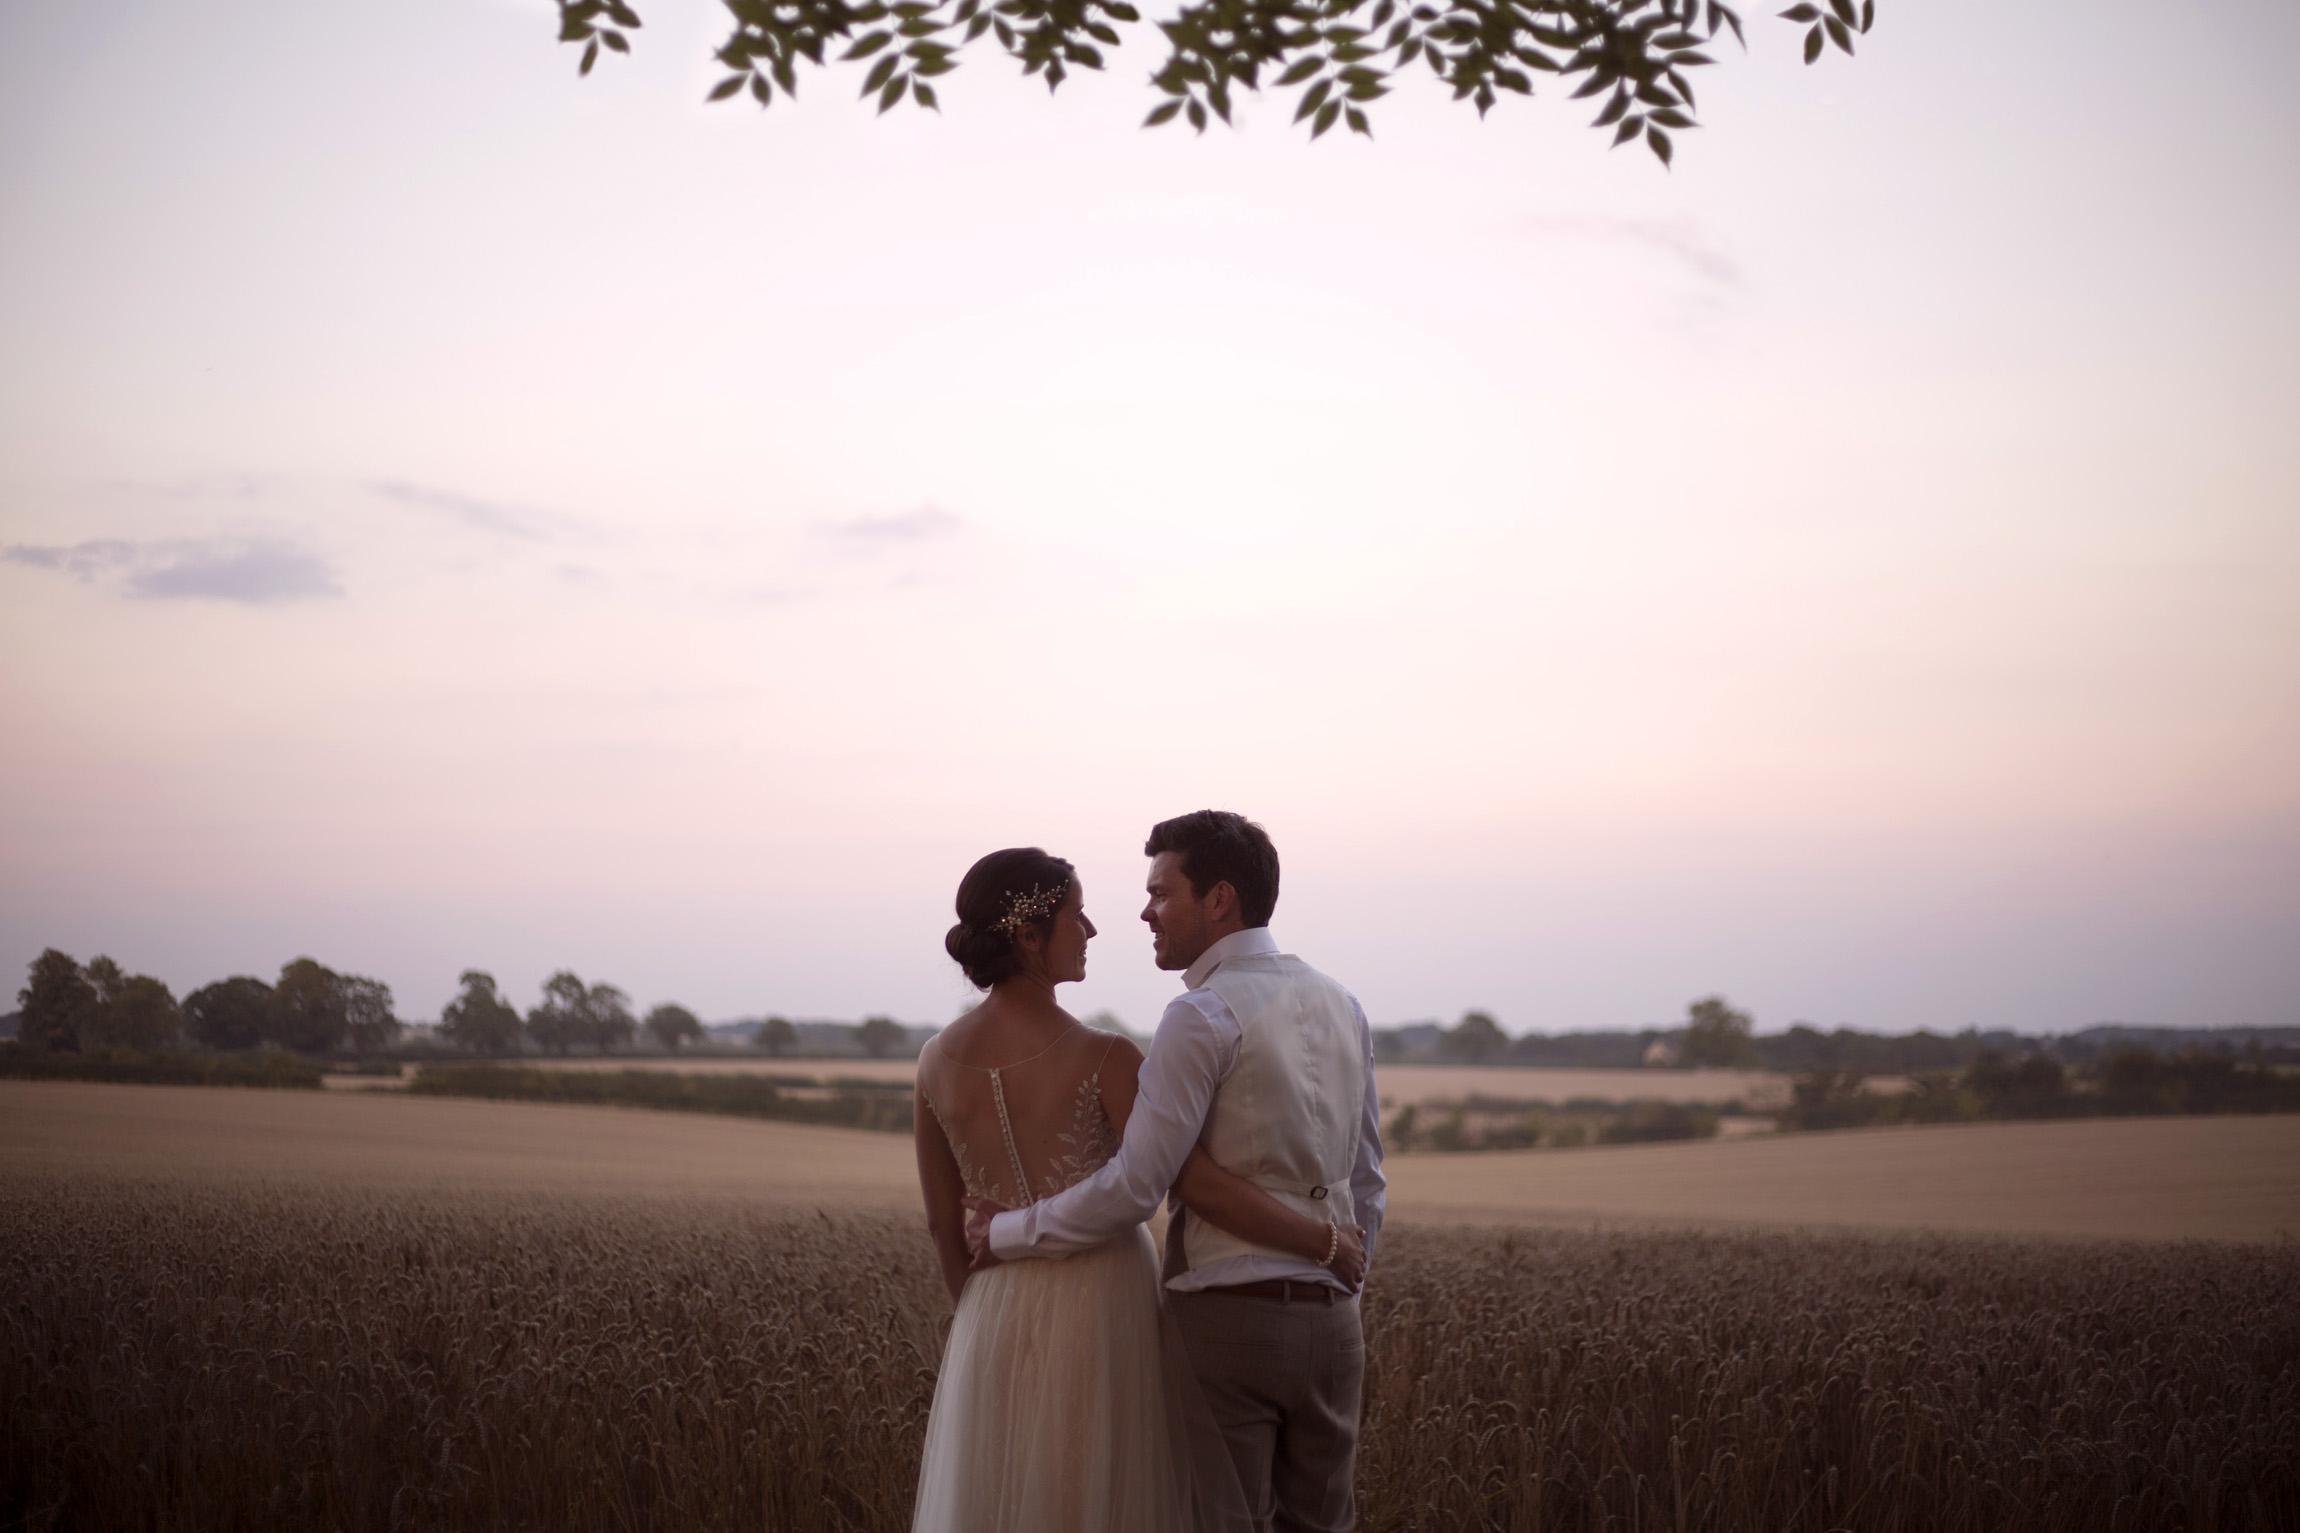 Embracing bride and groom portrait shoot in cornfield Cripps barn outdoor wedding photographer